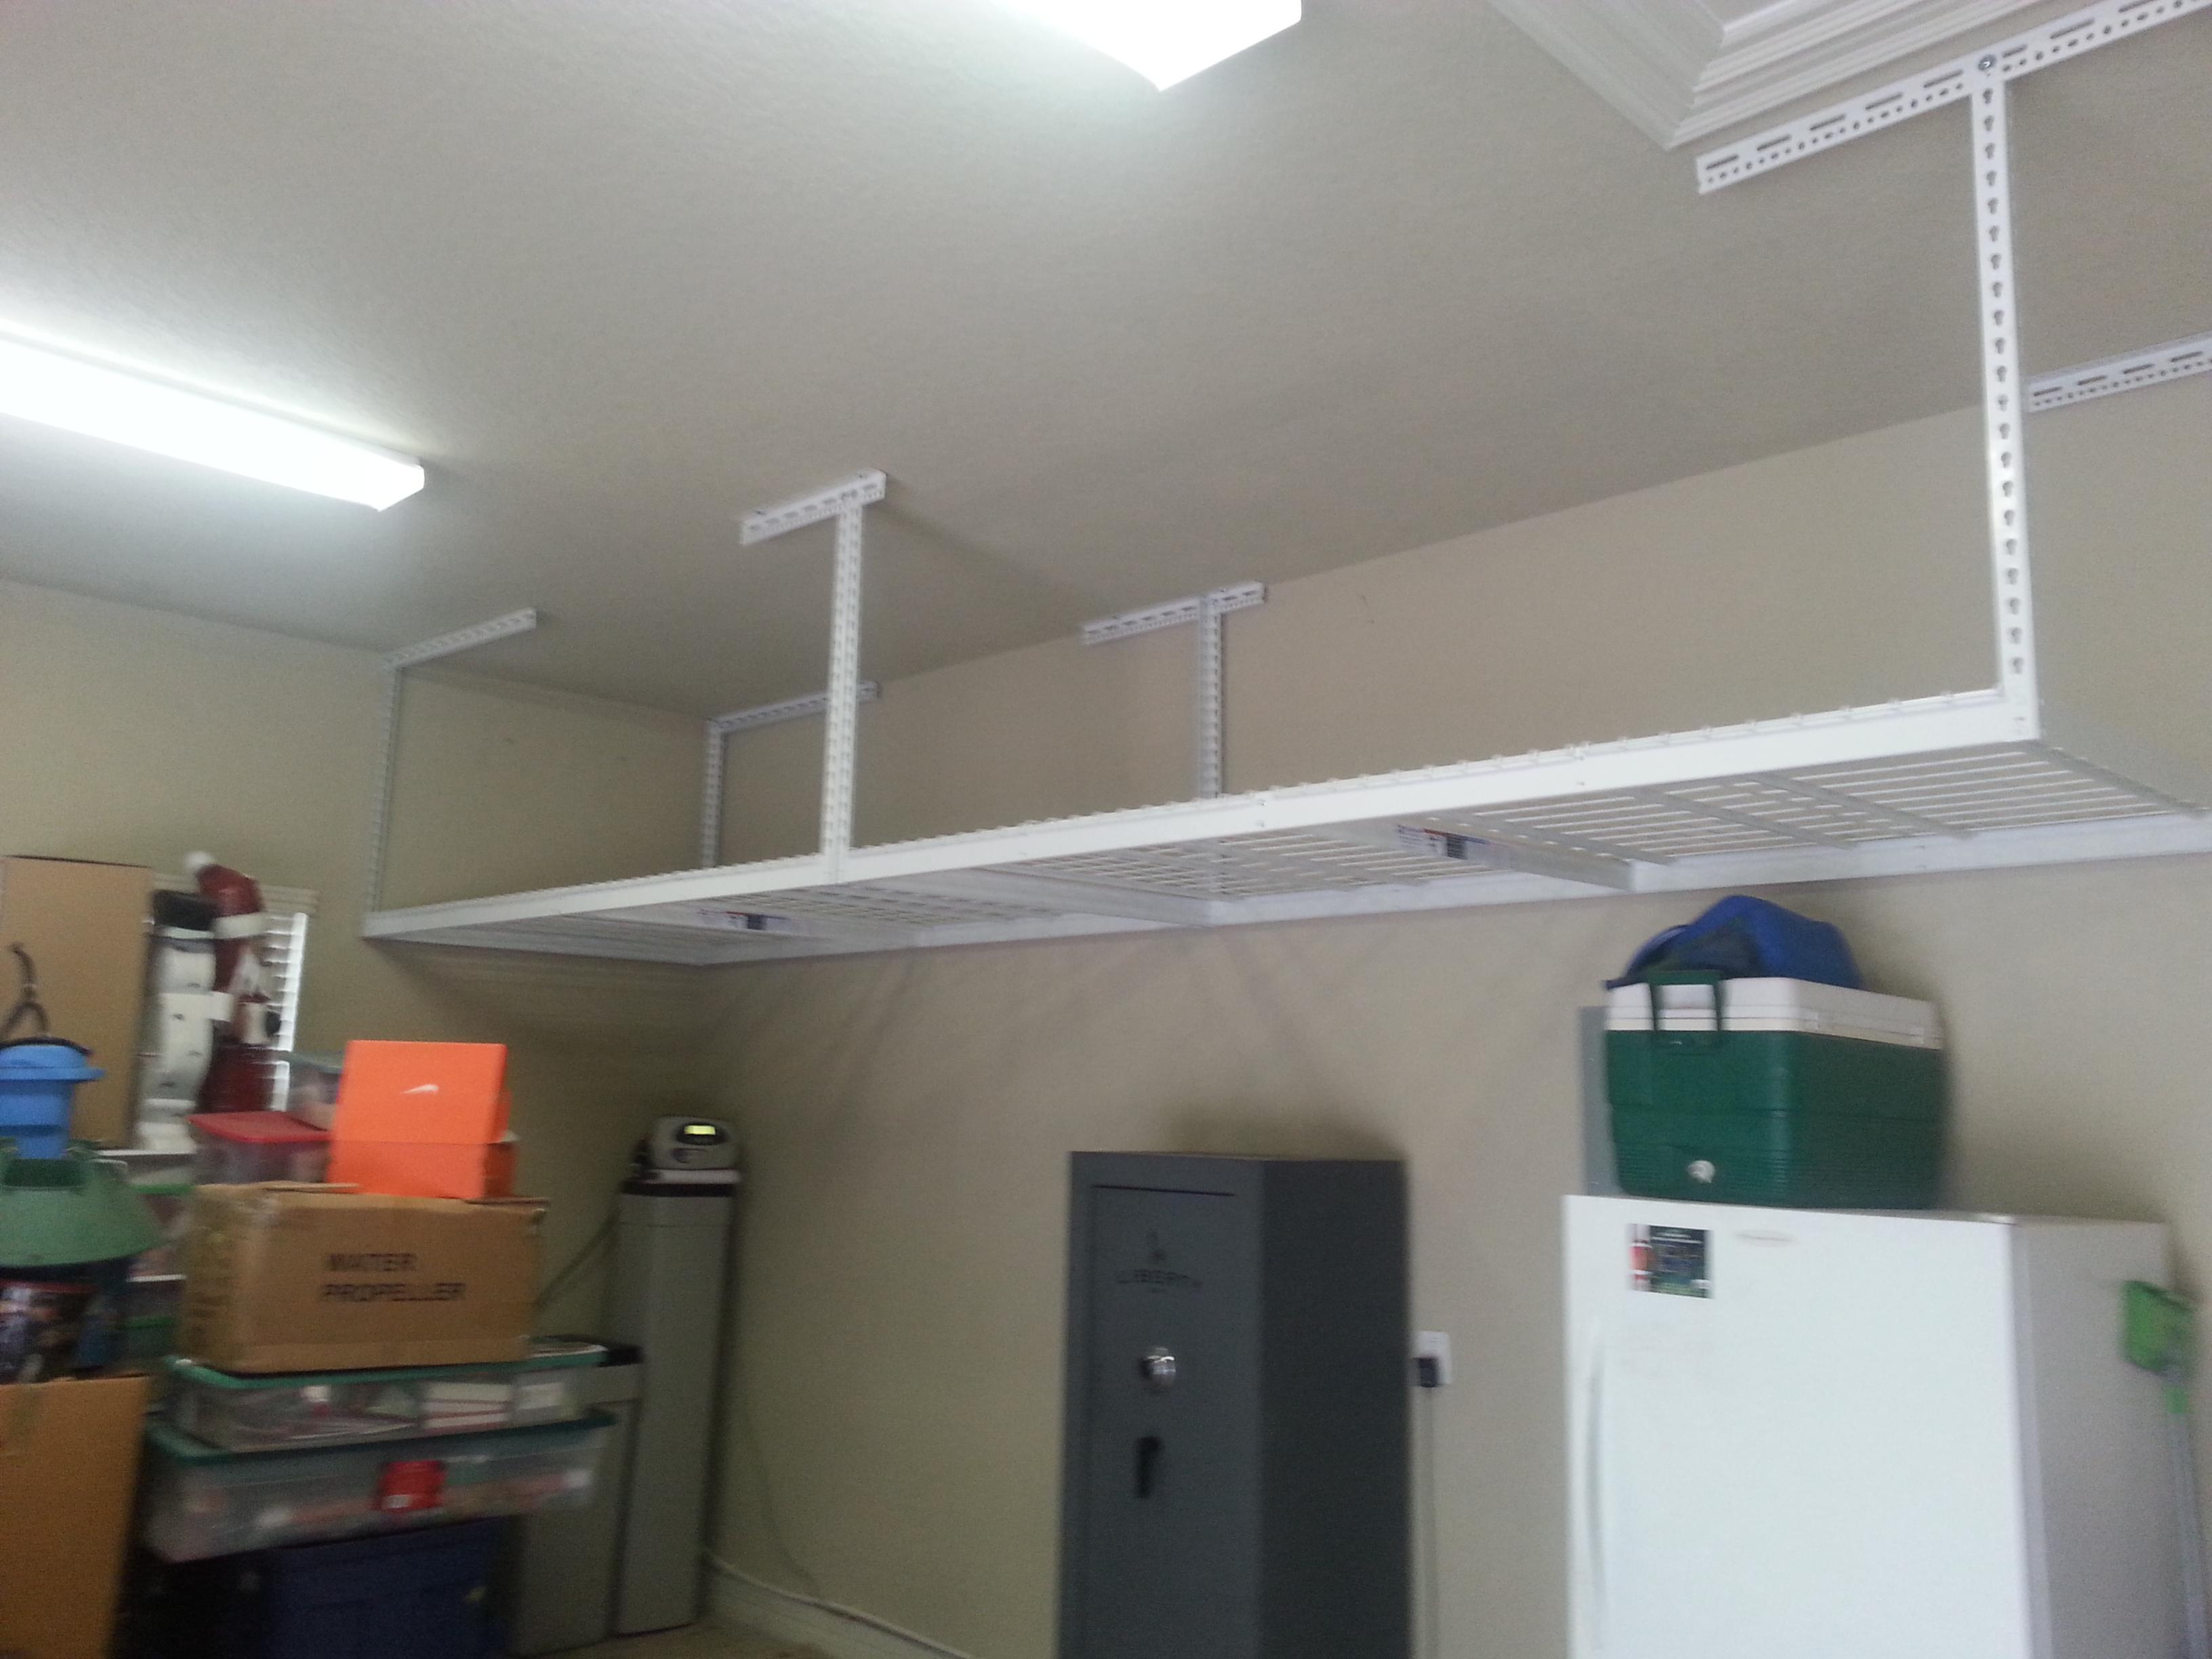 Saferacks Overhead Garage Storage Combo Kit Two 4 Ft X 8